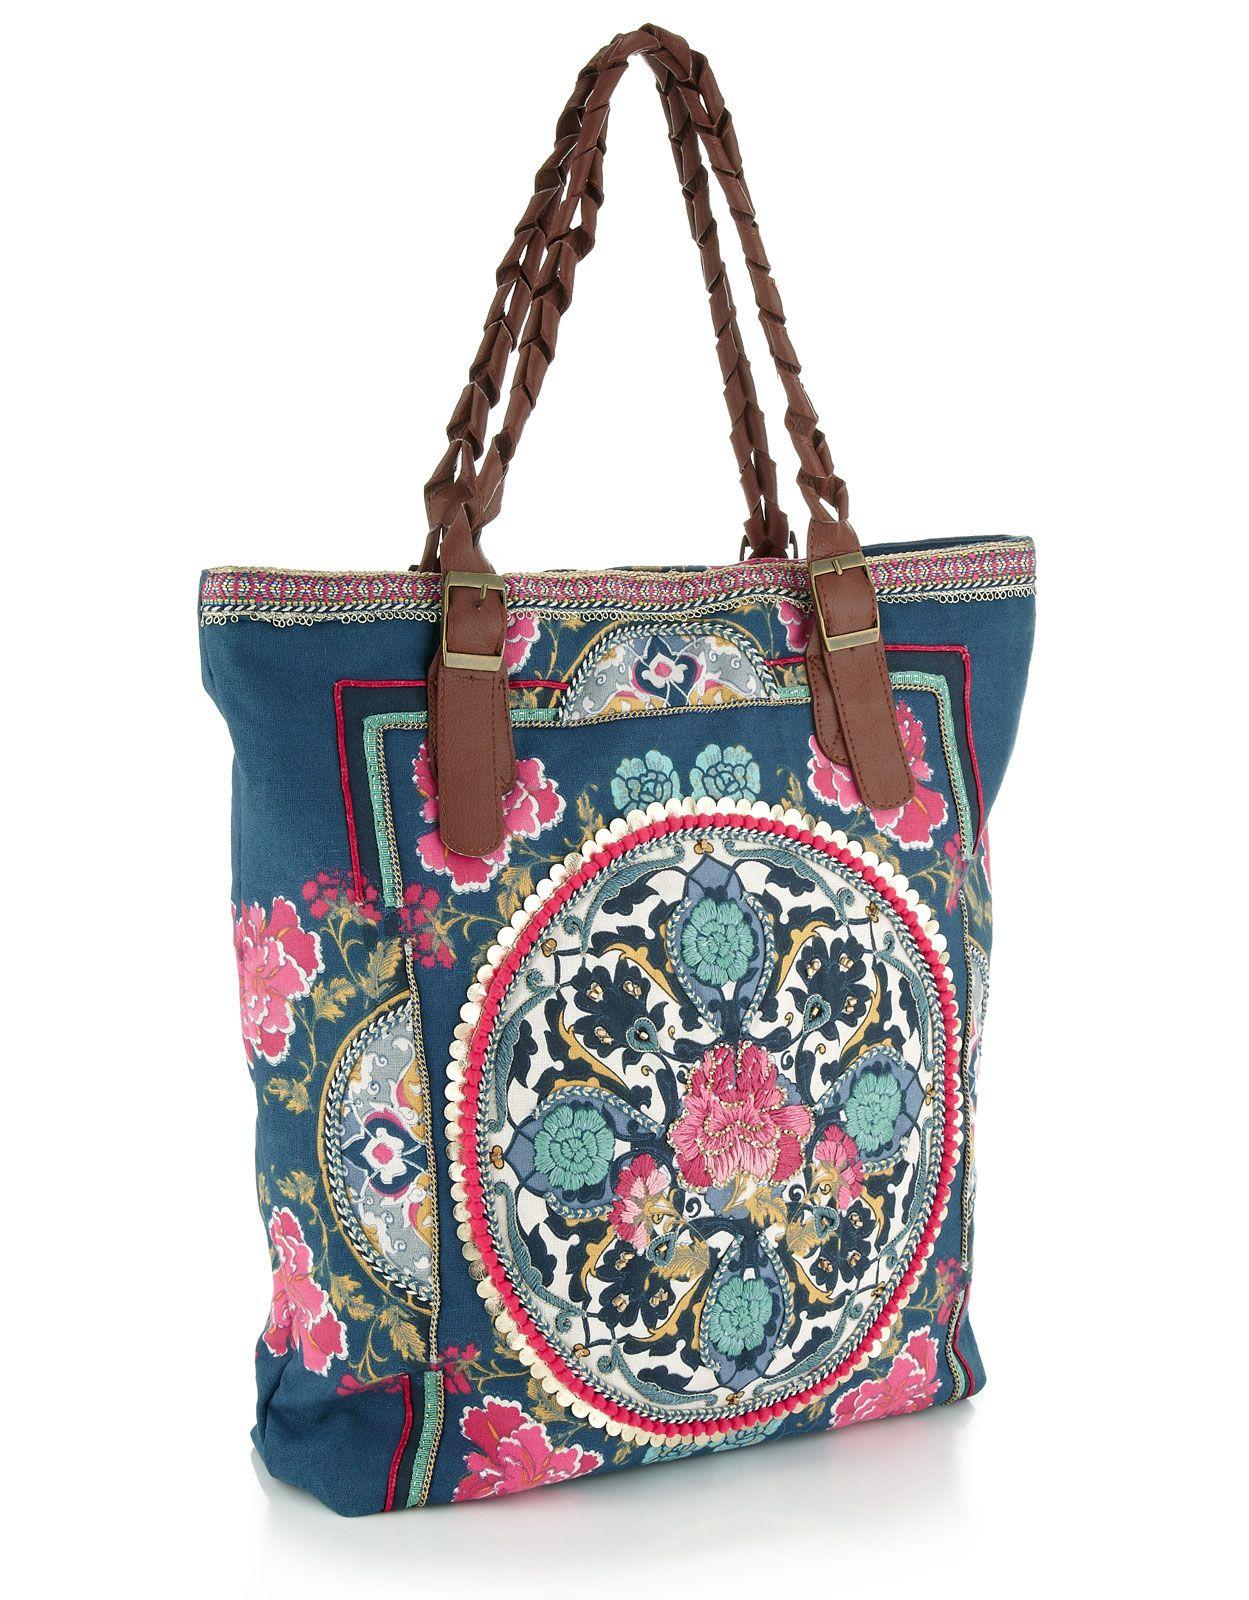 e10d699c8ffb accessorize embroidered tote bag | fashion | Floral tote bags ...